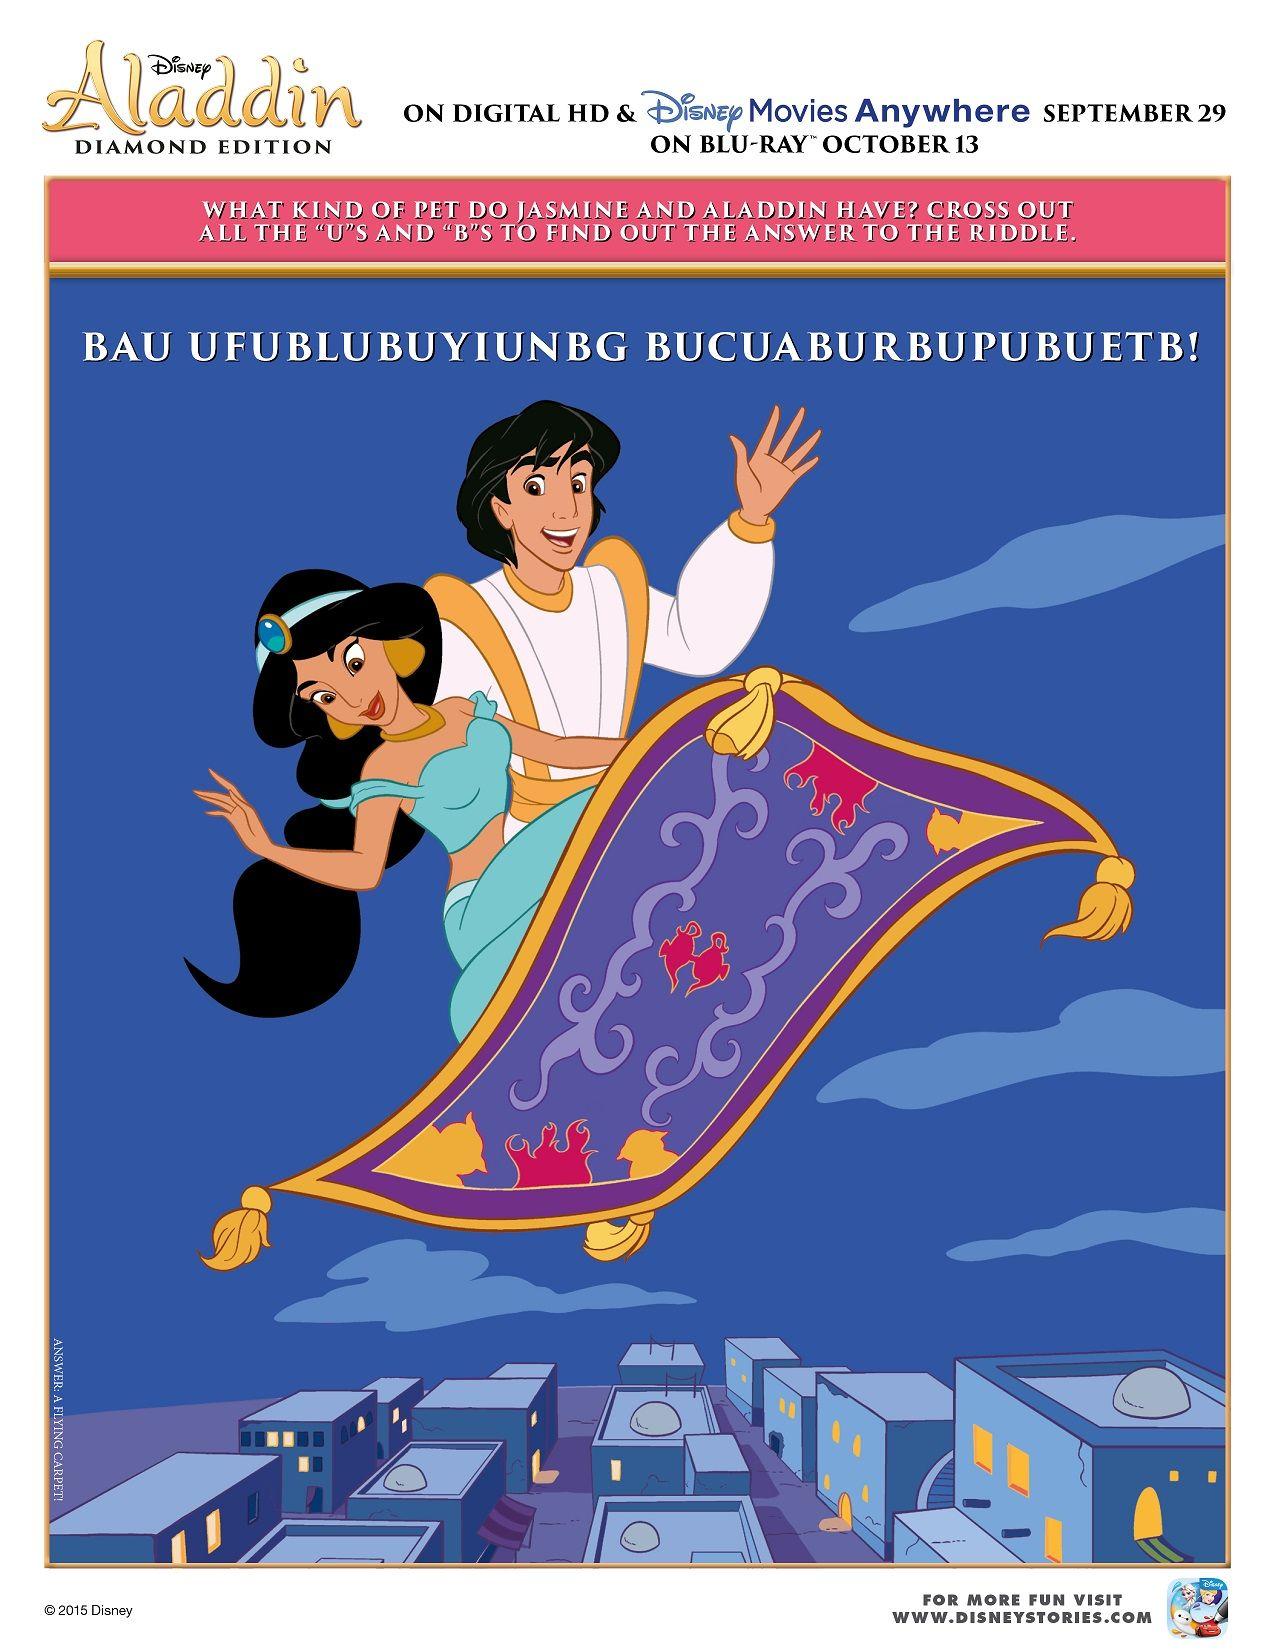 Free Printable Disney Aladdin Activity Sheets Diamond Edition Aladdin Disney Aladdin Activity Sheets